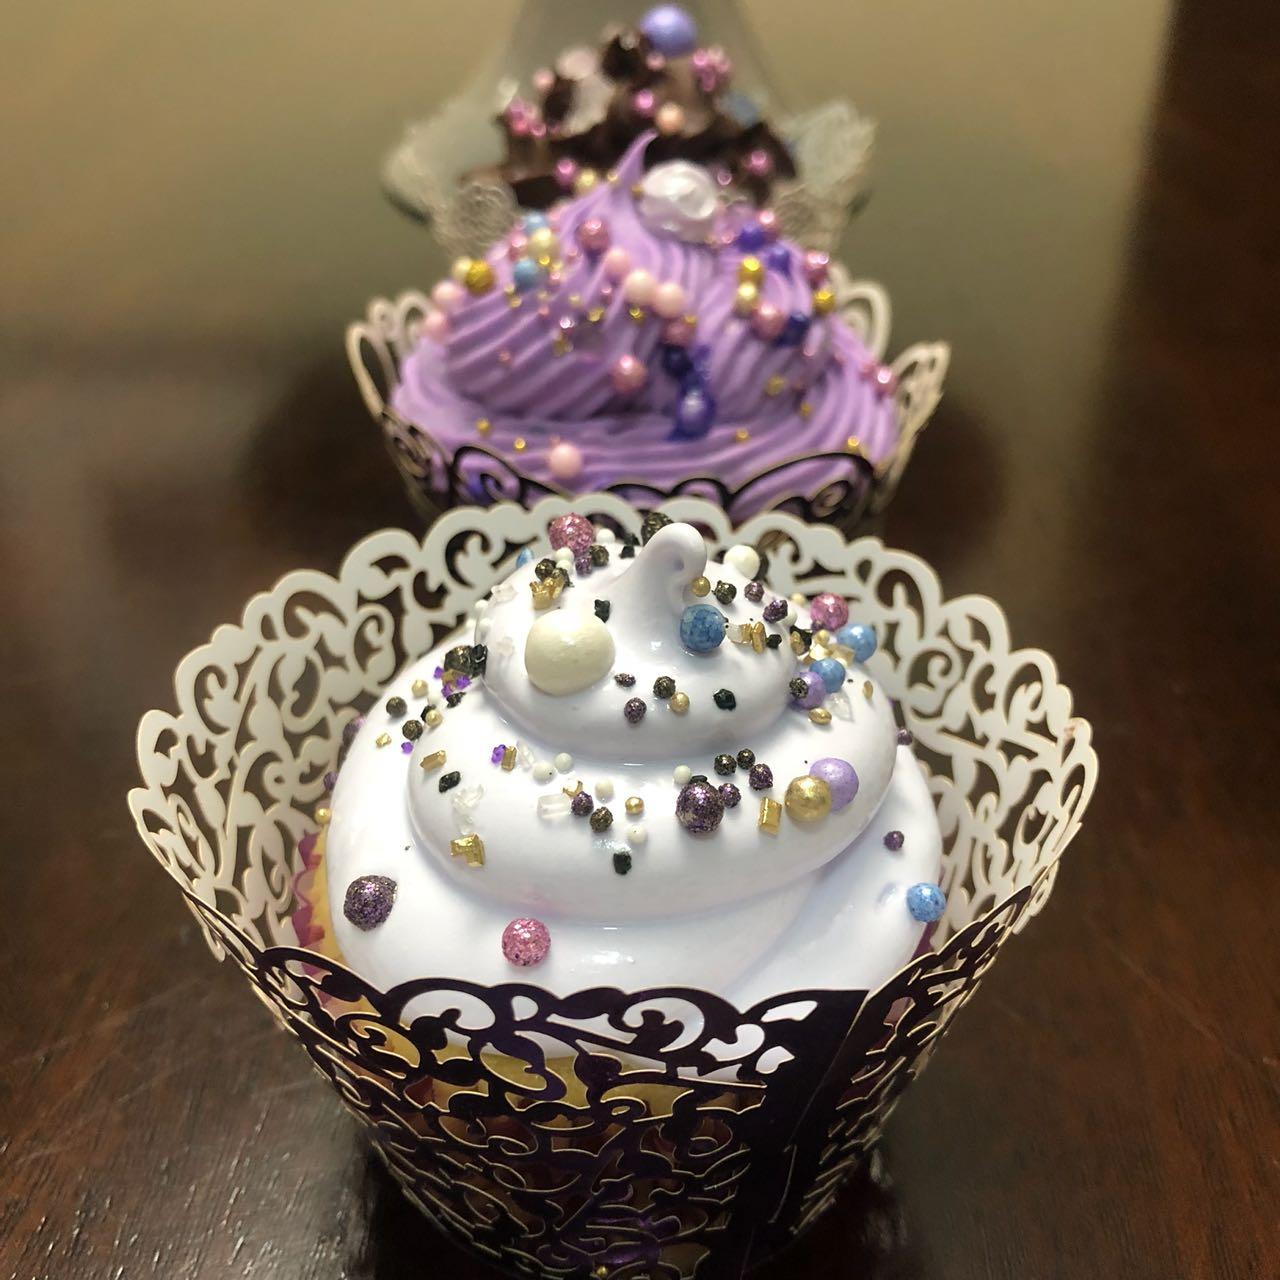 Cupcakes. Lemon Meringue Pie Cupcakes. Purple Ombre. Fluffy Frosting. Sprinkles. Wedding Cupcakes.